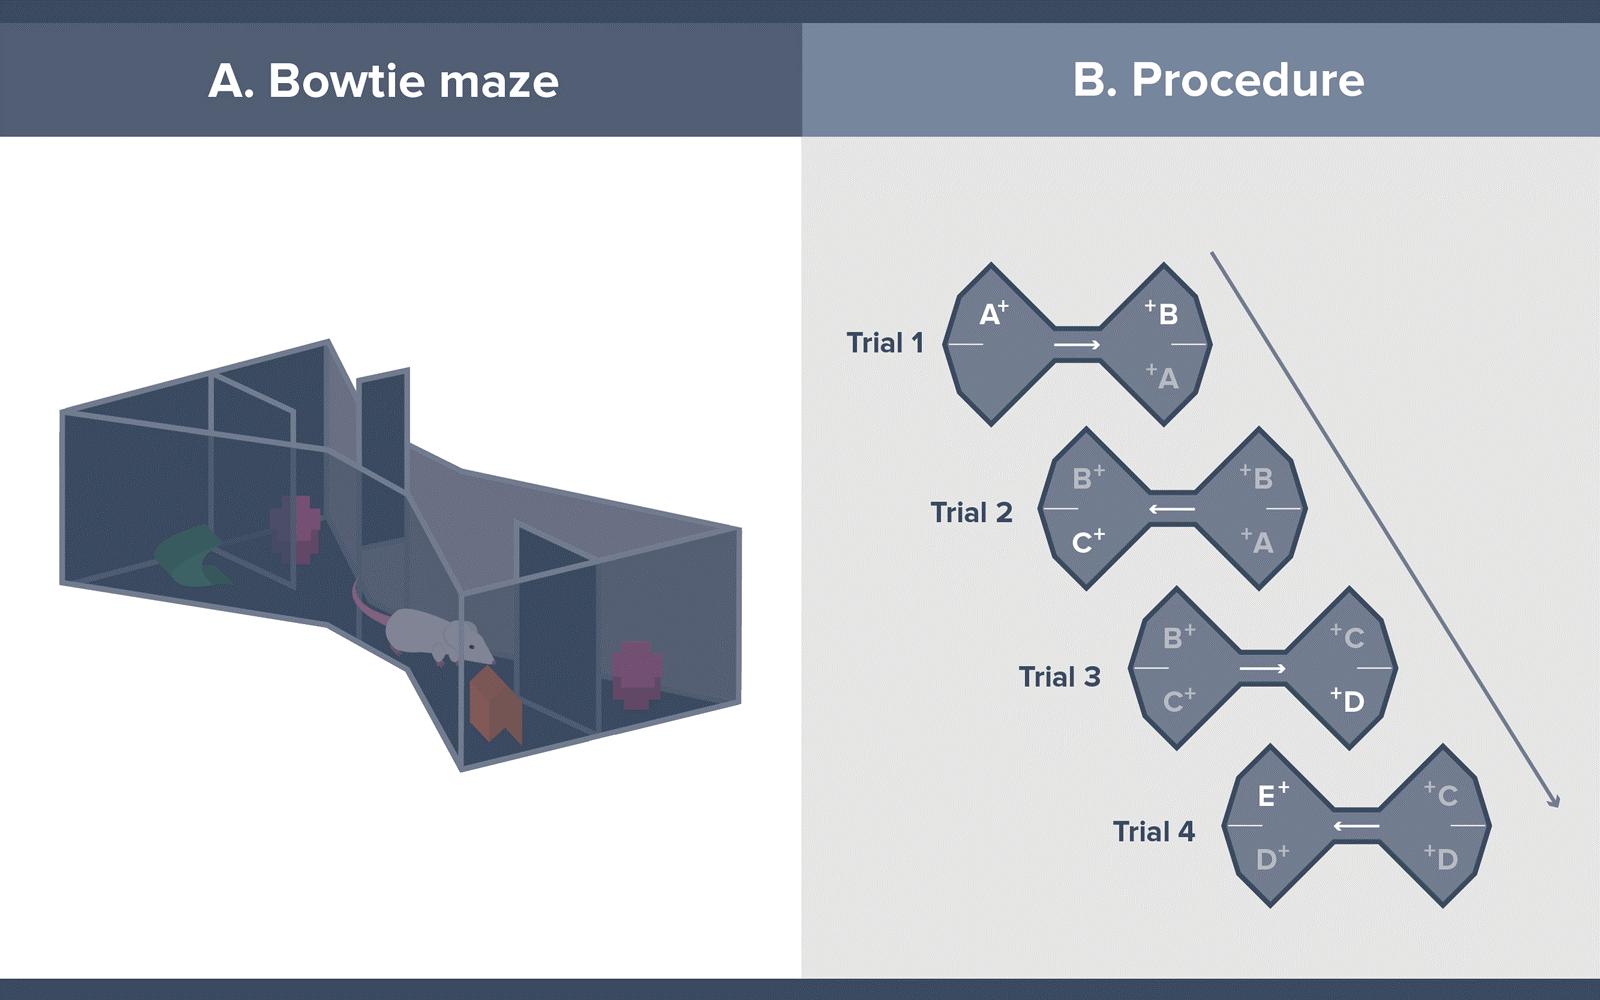 Bowtie Mazes procedure figure